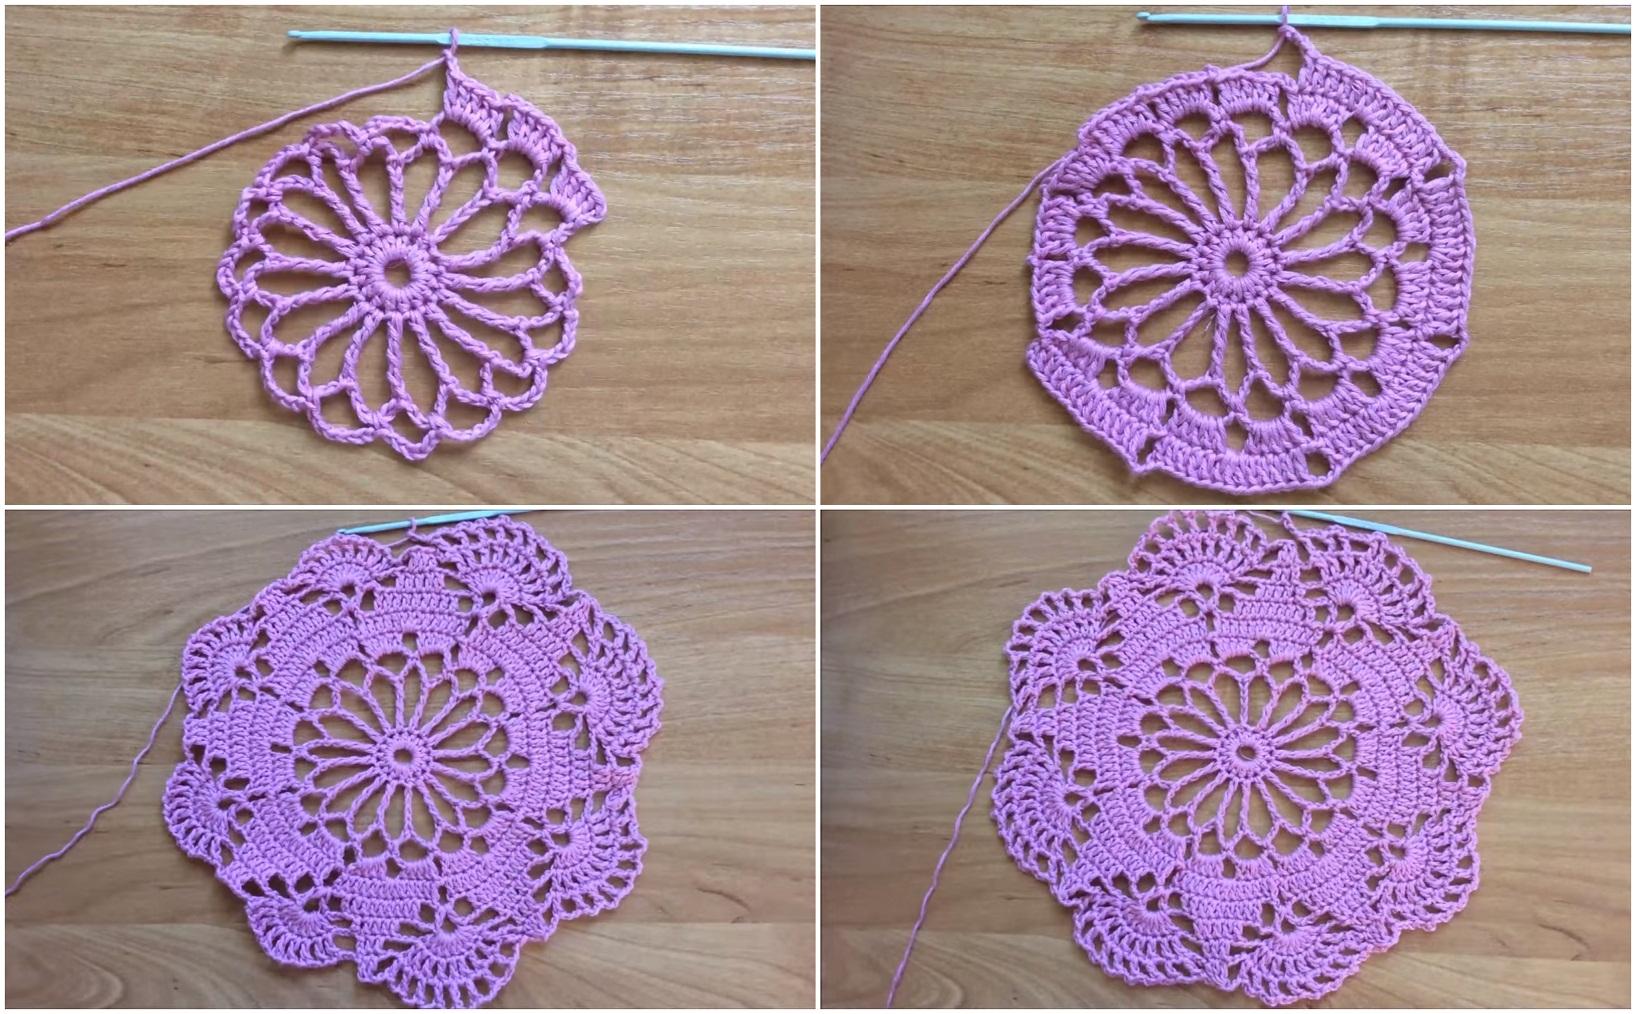 Easy To Make Doily Free Crochet Pattern Yarn Hooks